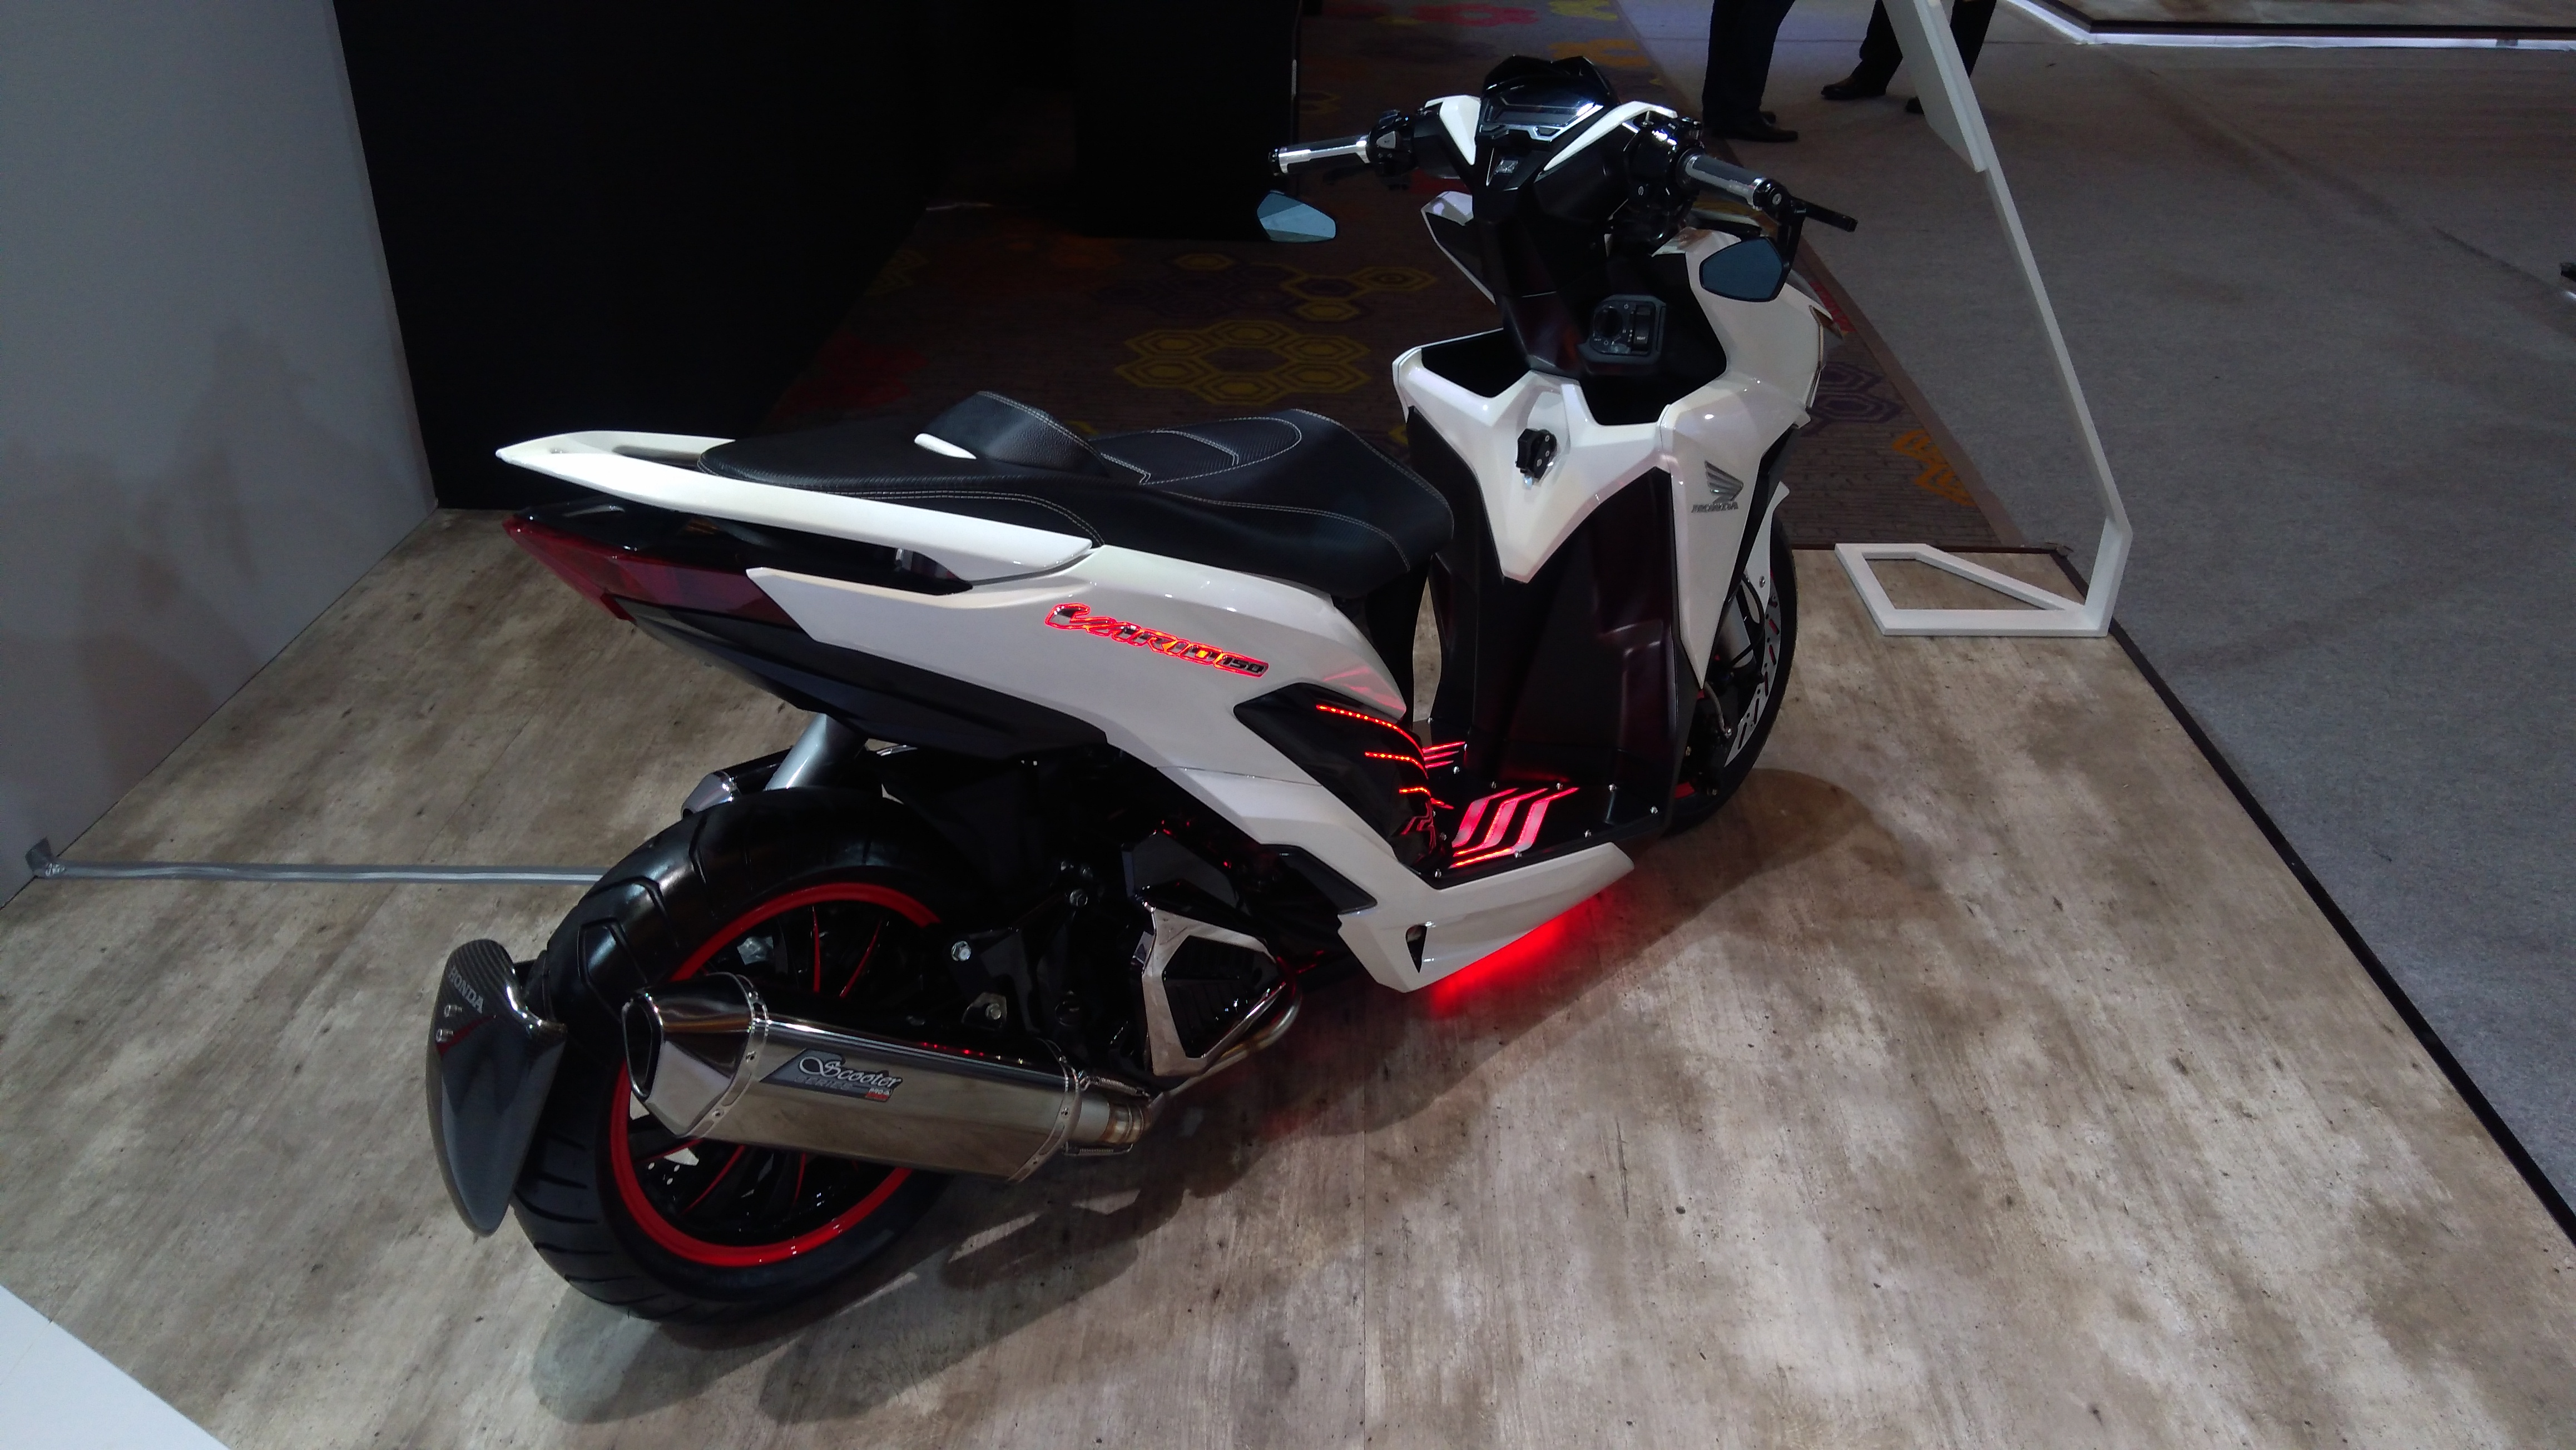 Modifikasi Futuristik Honda Vario 150 Kaki Kaki Pakai Air